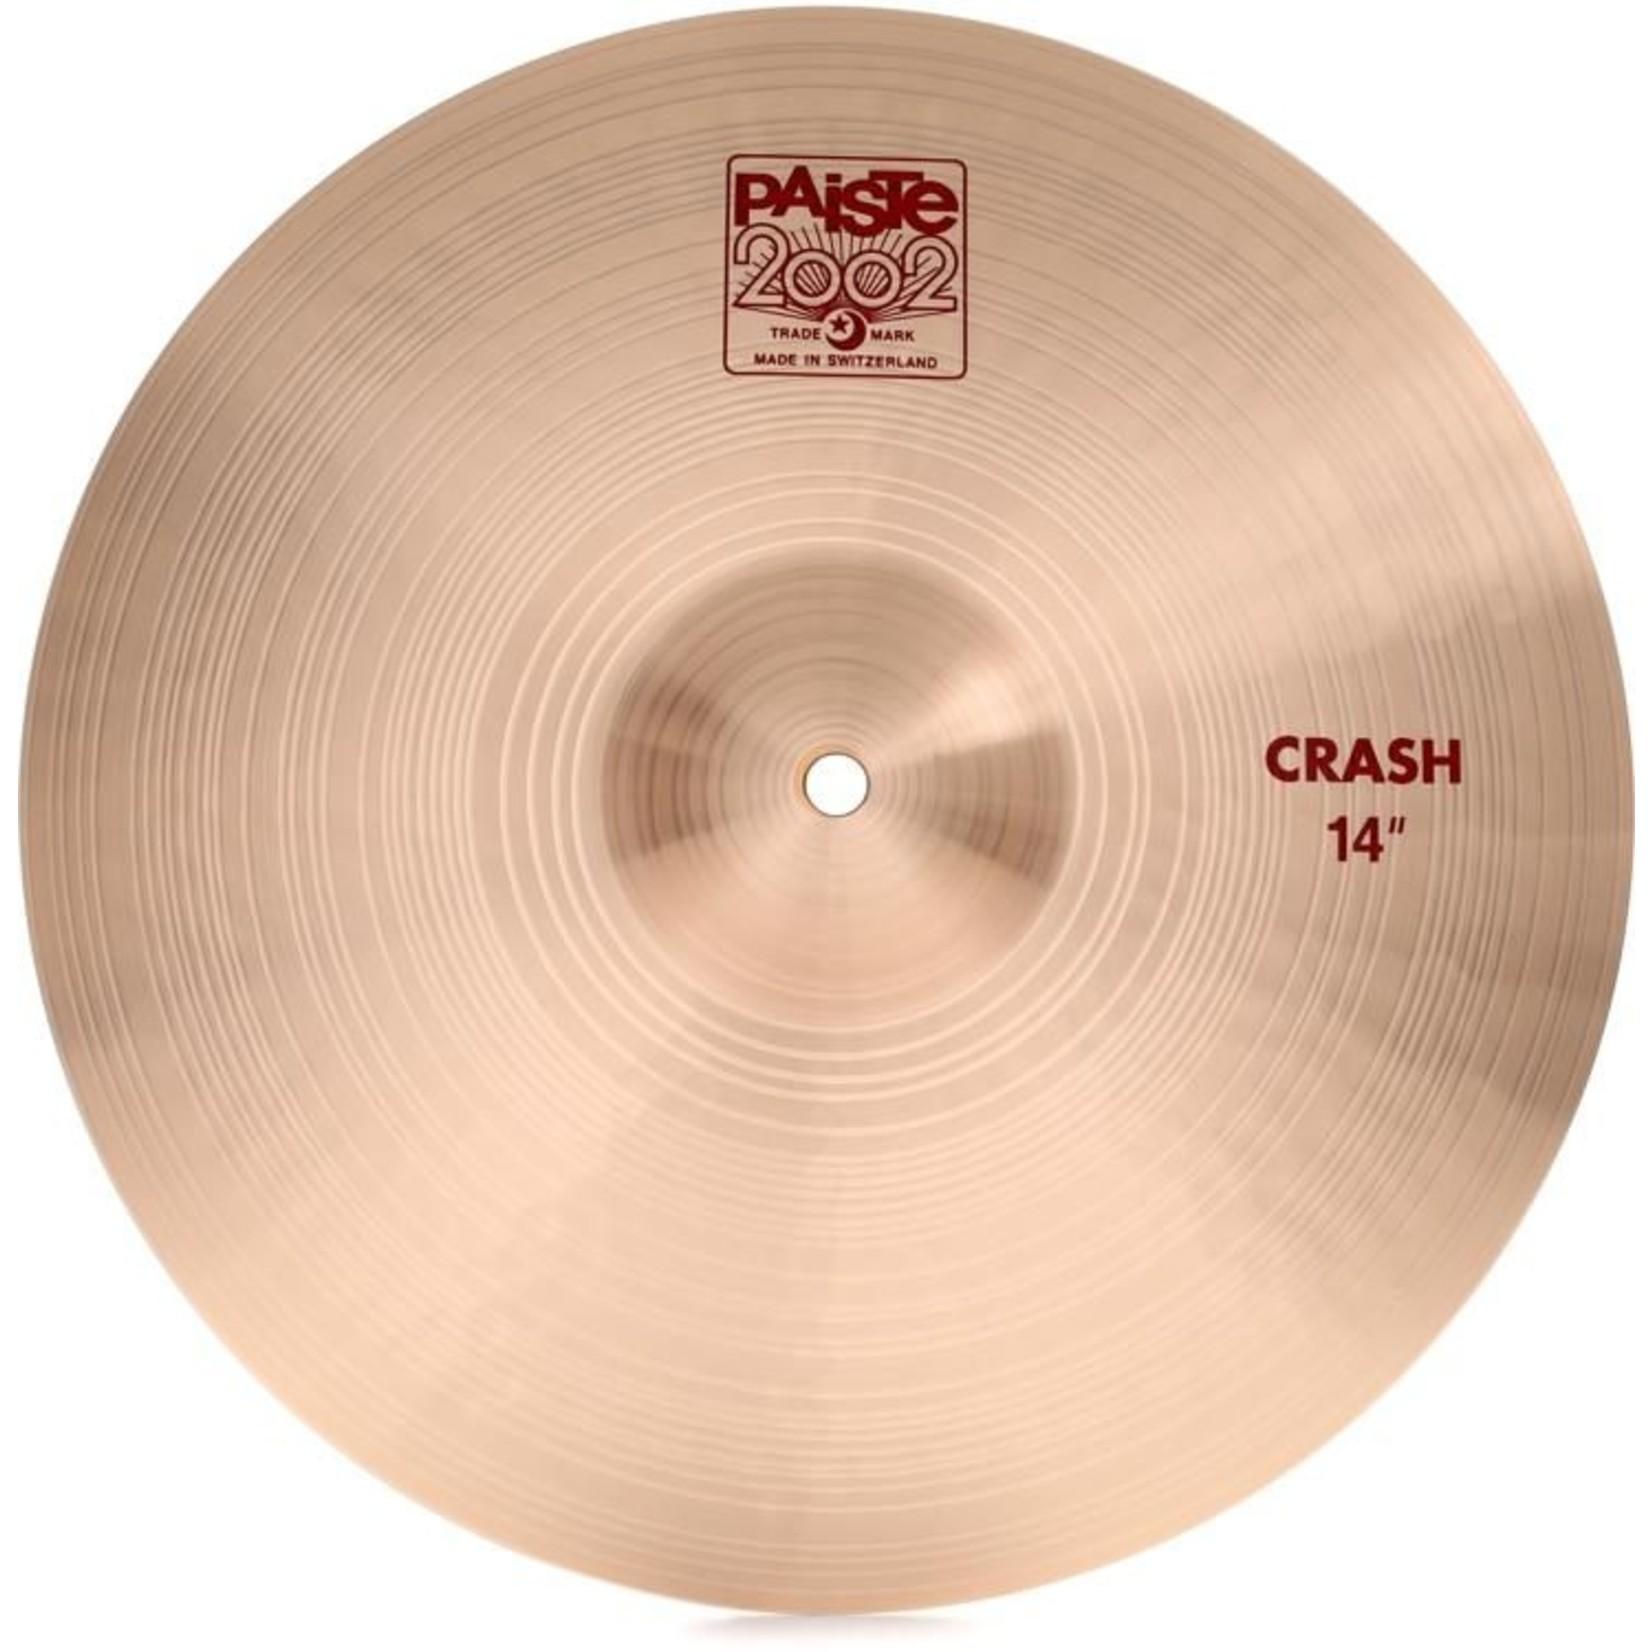 "Paiste PAISTE 14"" 2002 CRASH"